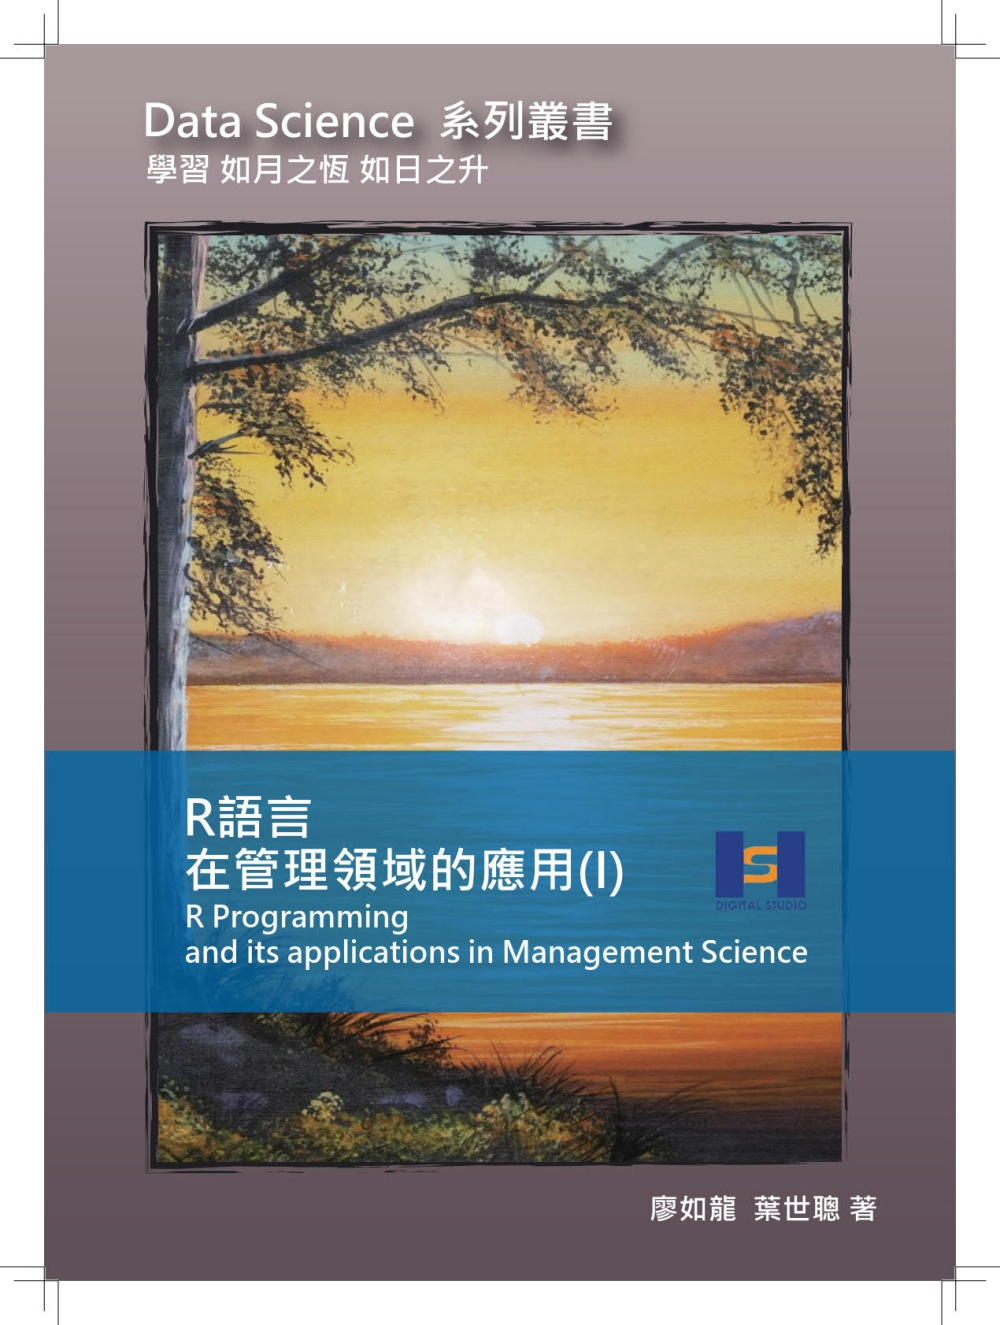 R語言在管理領域的應用(Ⅰ)